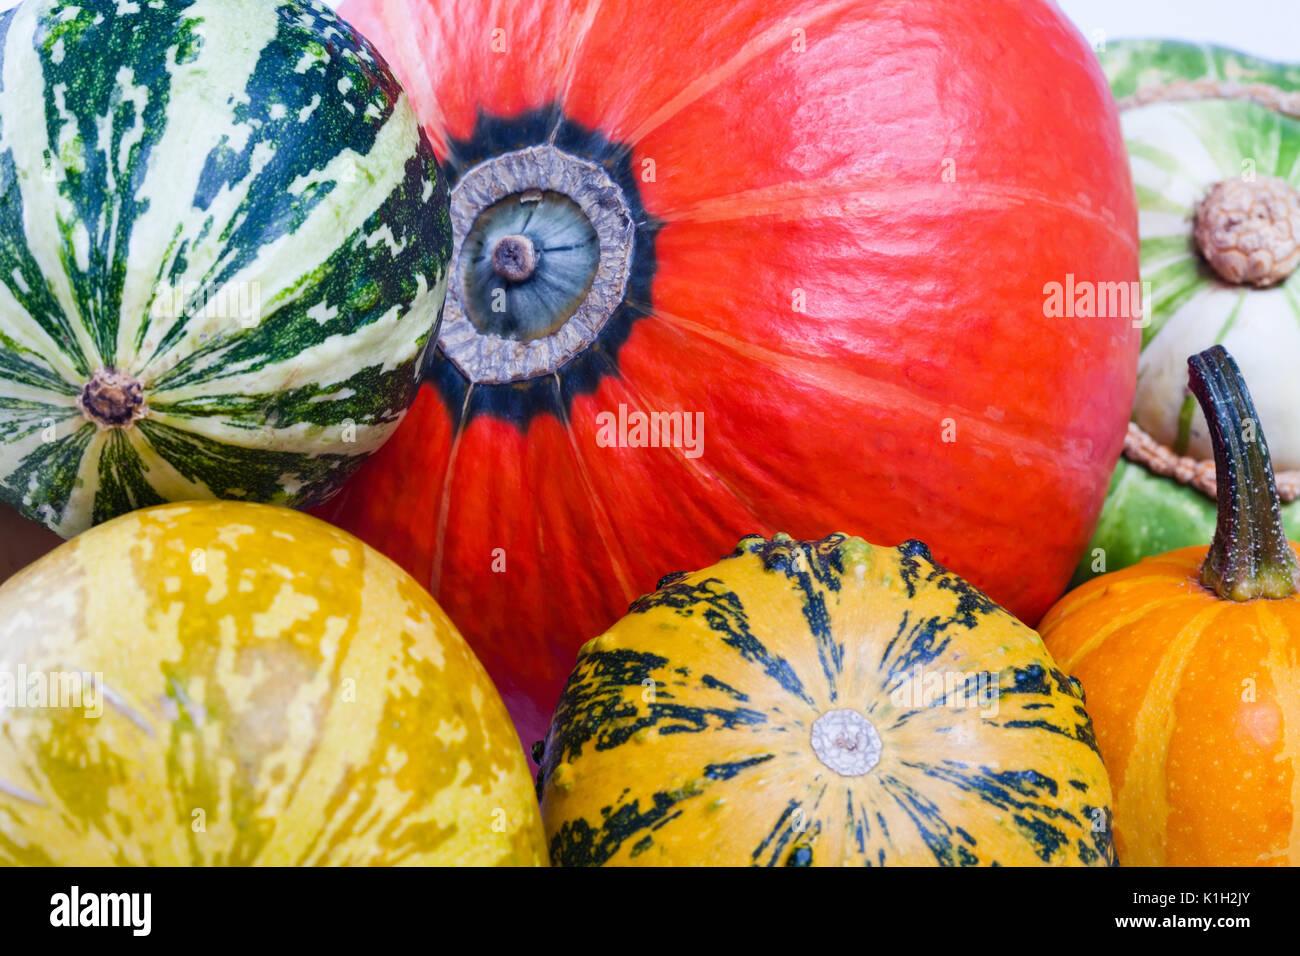 Colorful pumpkins. Halloween pumpkins. Pumpkin varieties.  - Stock Image